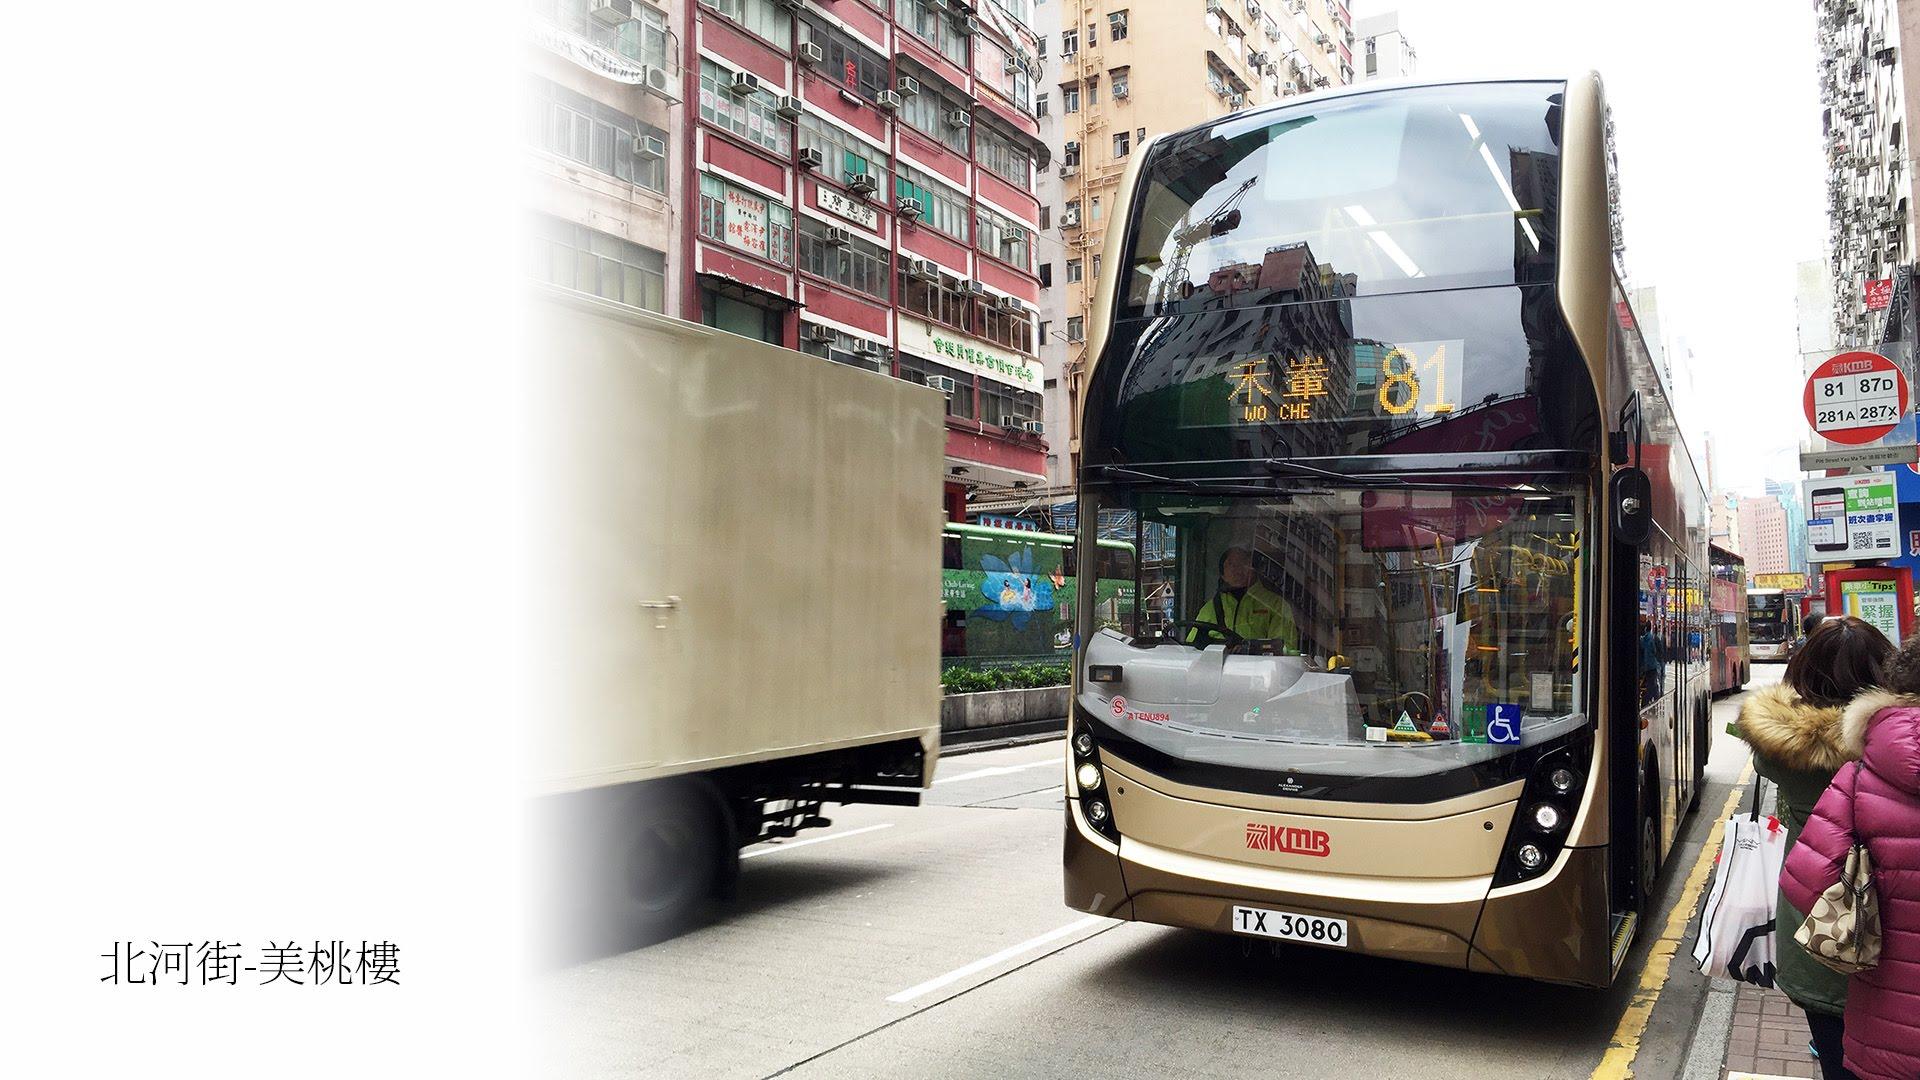 Hong Kong Bus KMB ATENU894 @ 81 九龍巴士 Dennis Enviro E50D 北河街-美桃樓